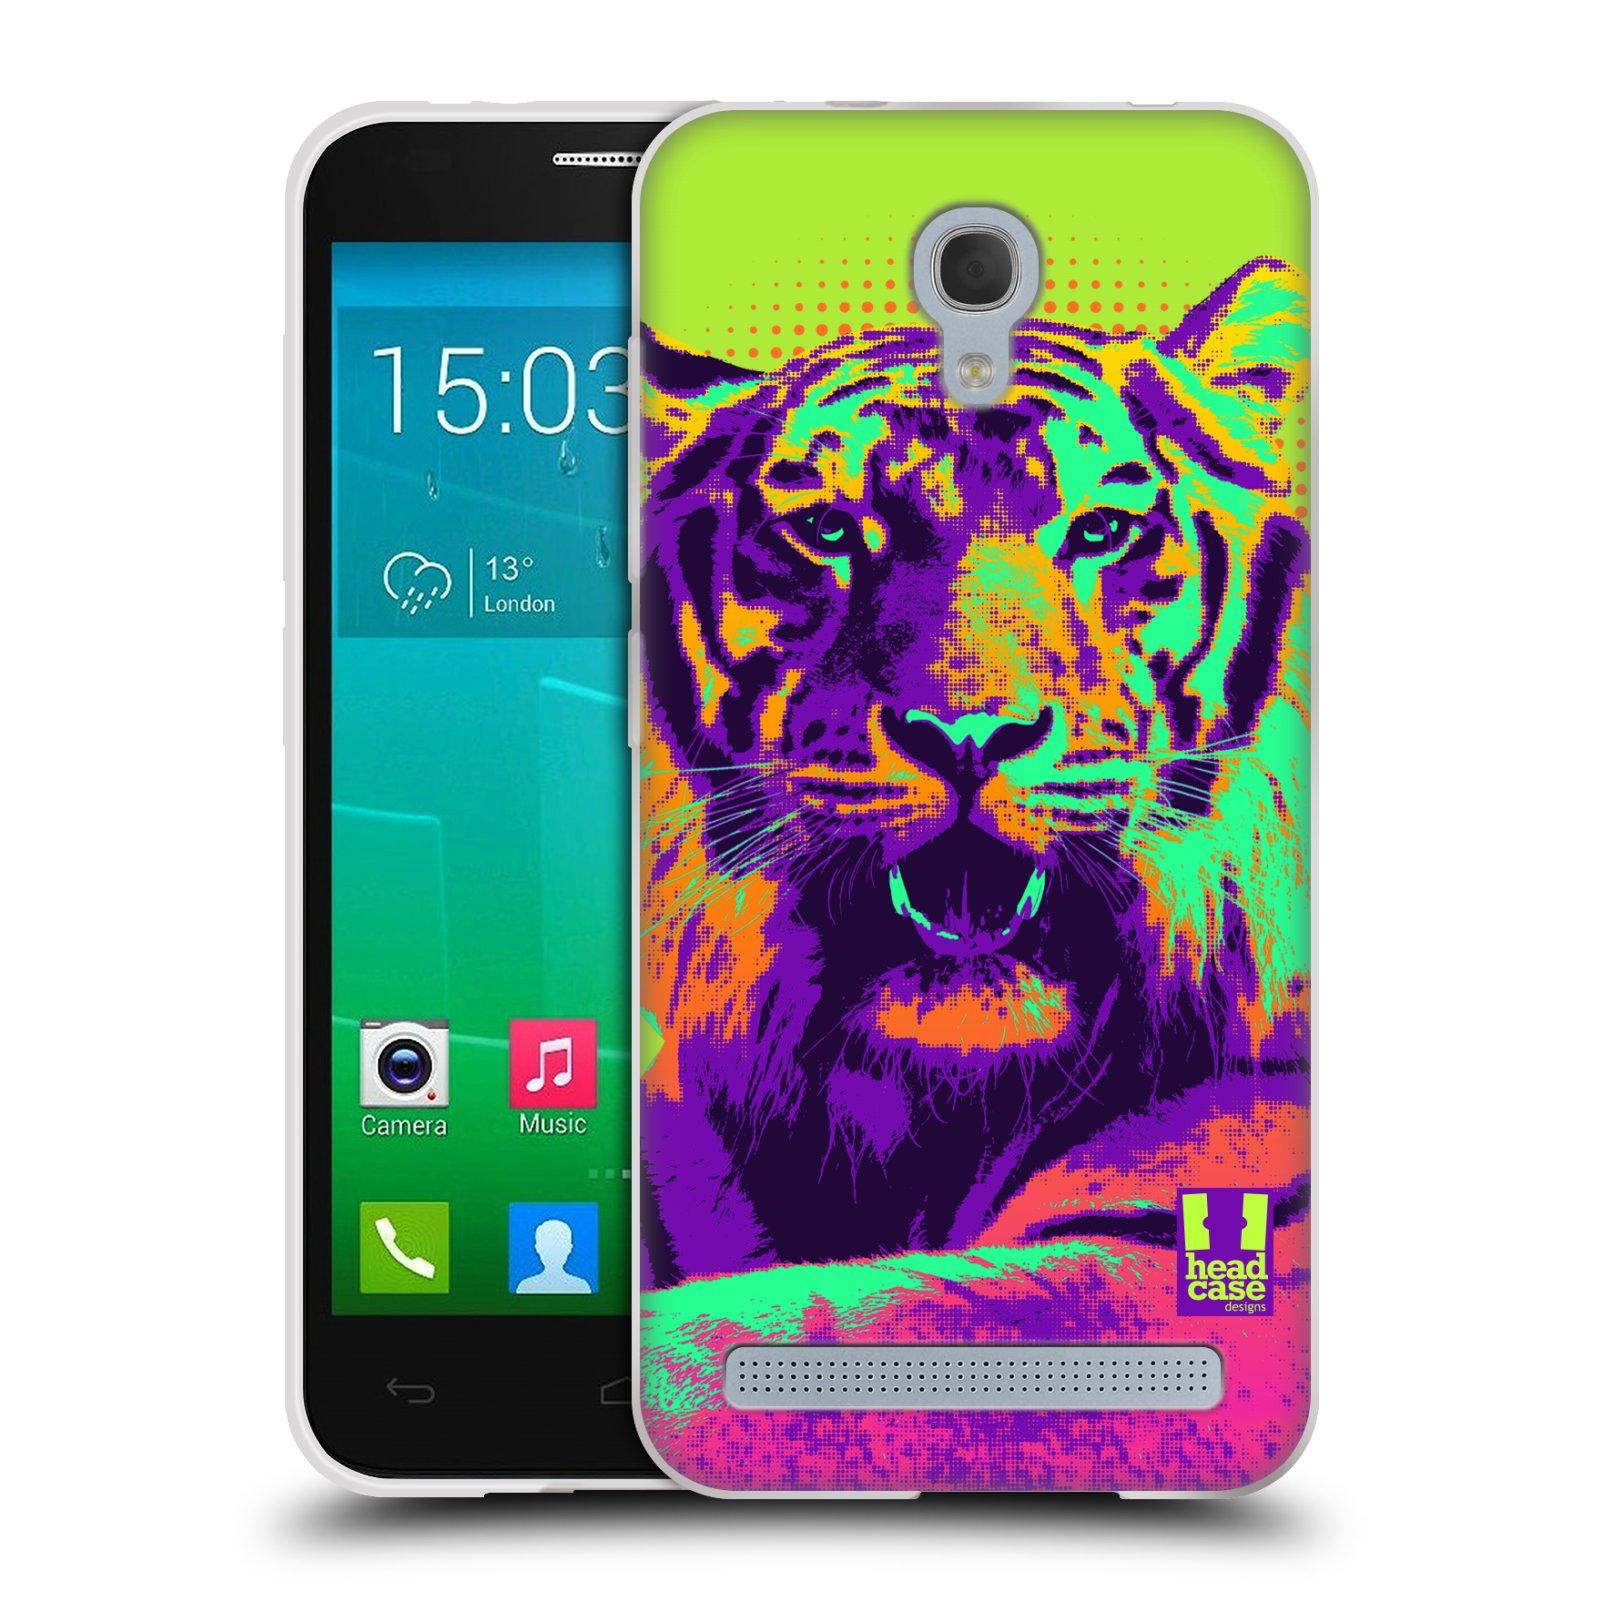 Silikonové pouzdro na mobil Alcatel One Touch Idol 2 Mini S 6036Y HEAD CASE POP PRINT TYGR (Silikonový kryt či obal na mobilní telefon Alcatel Idol 2 Mini S OT-6036Y)